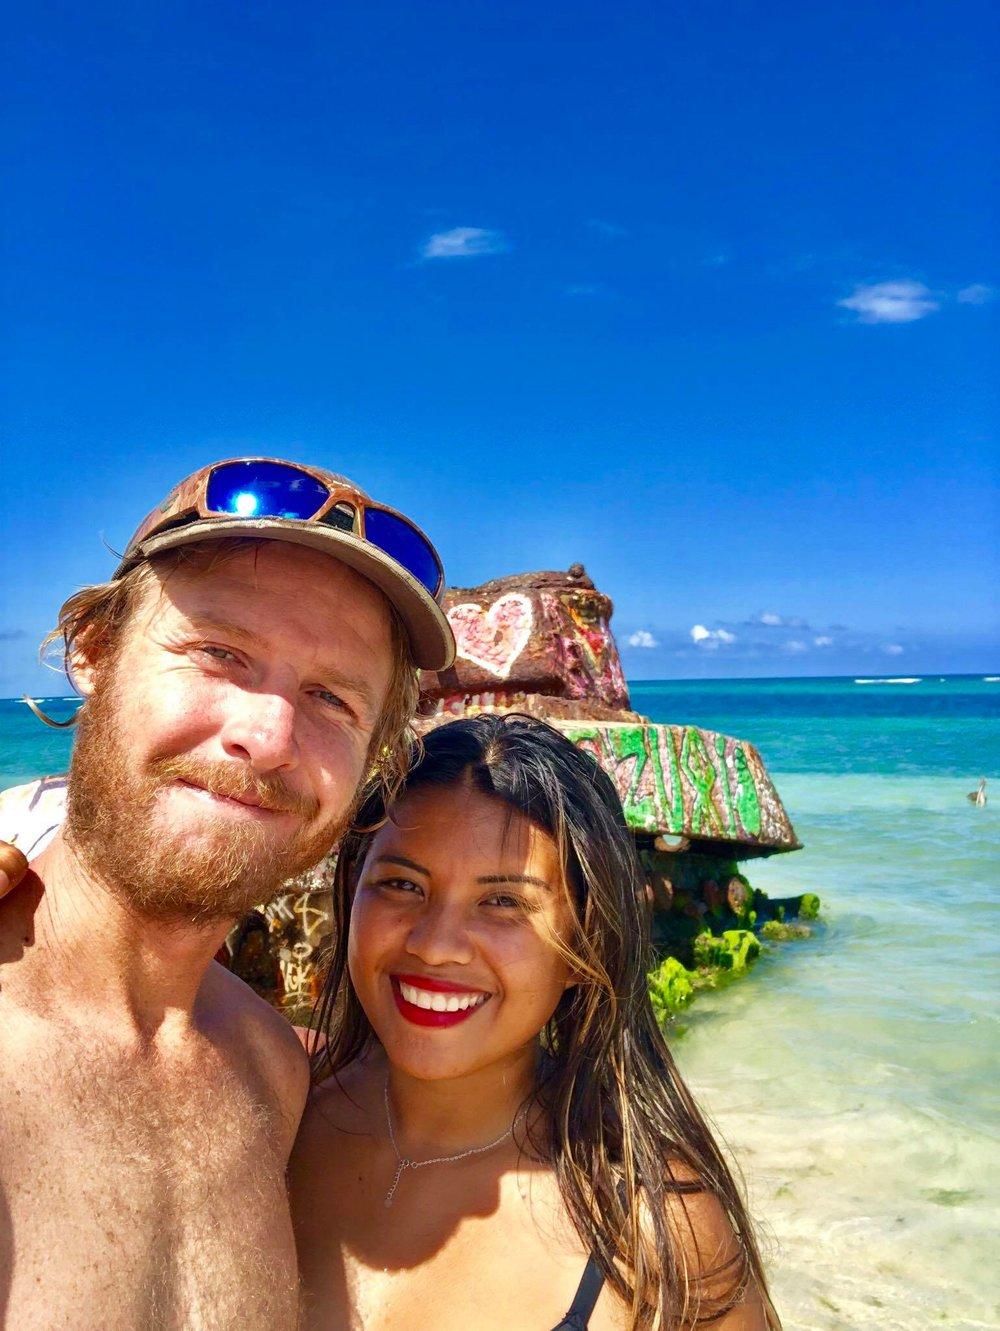 Sailing Life Day 349 Day trip to Culebra2.jpg